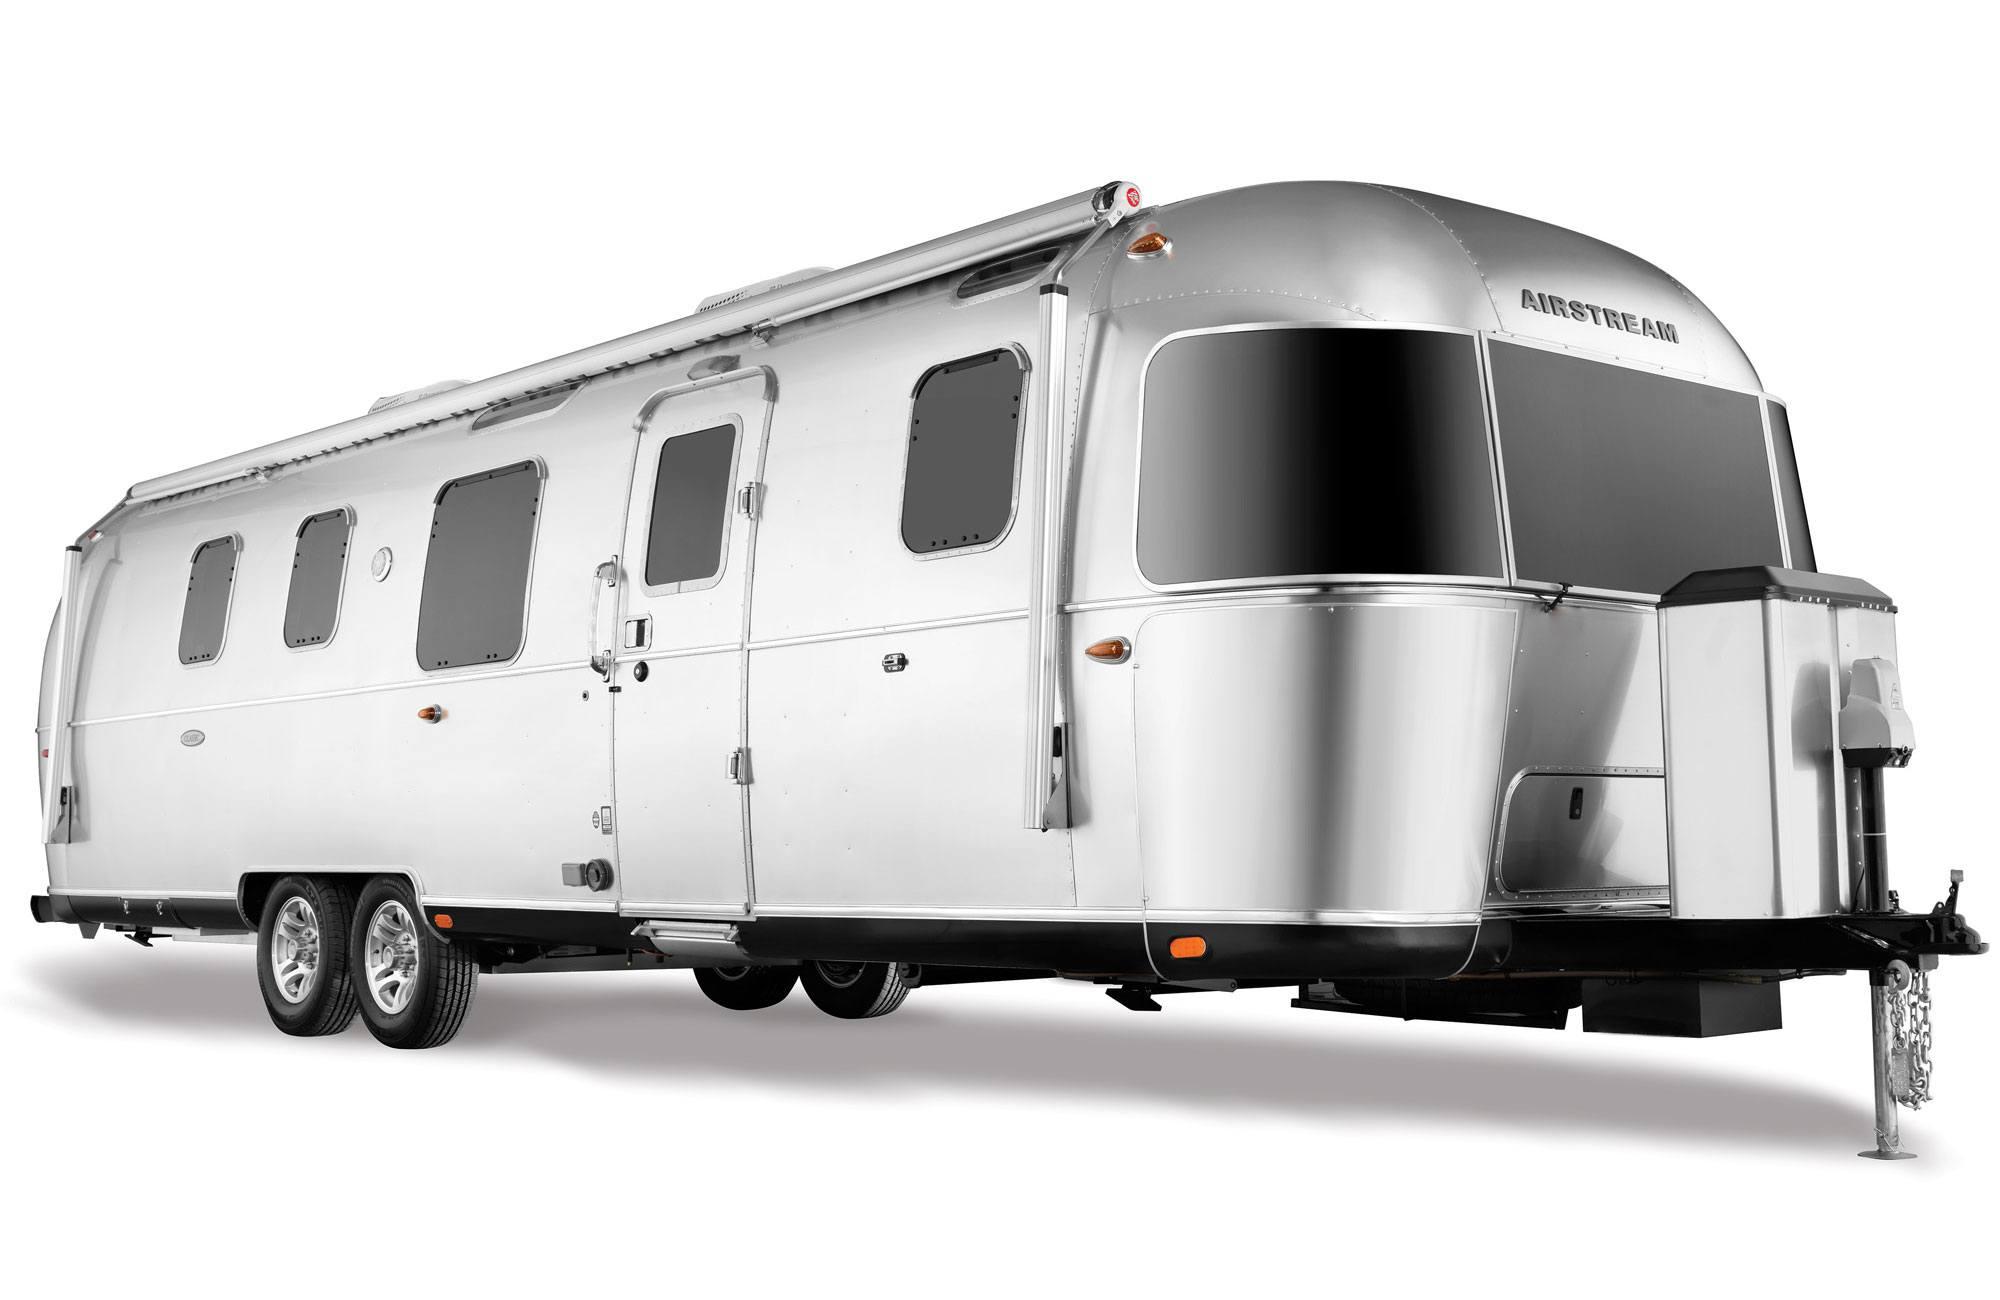 dealer airstream dealer locator travel trailers airstream. Black Bedroom Furniture Sets. Home Design Ideas